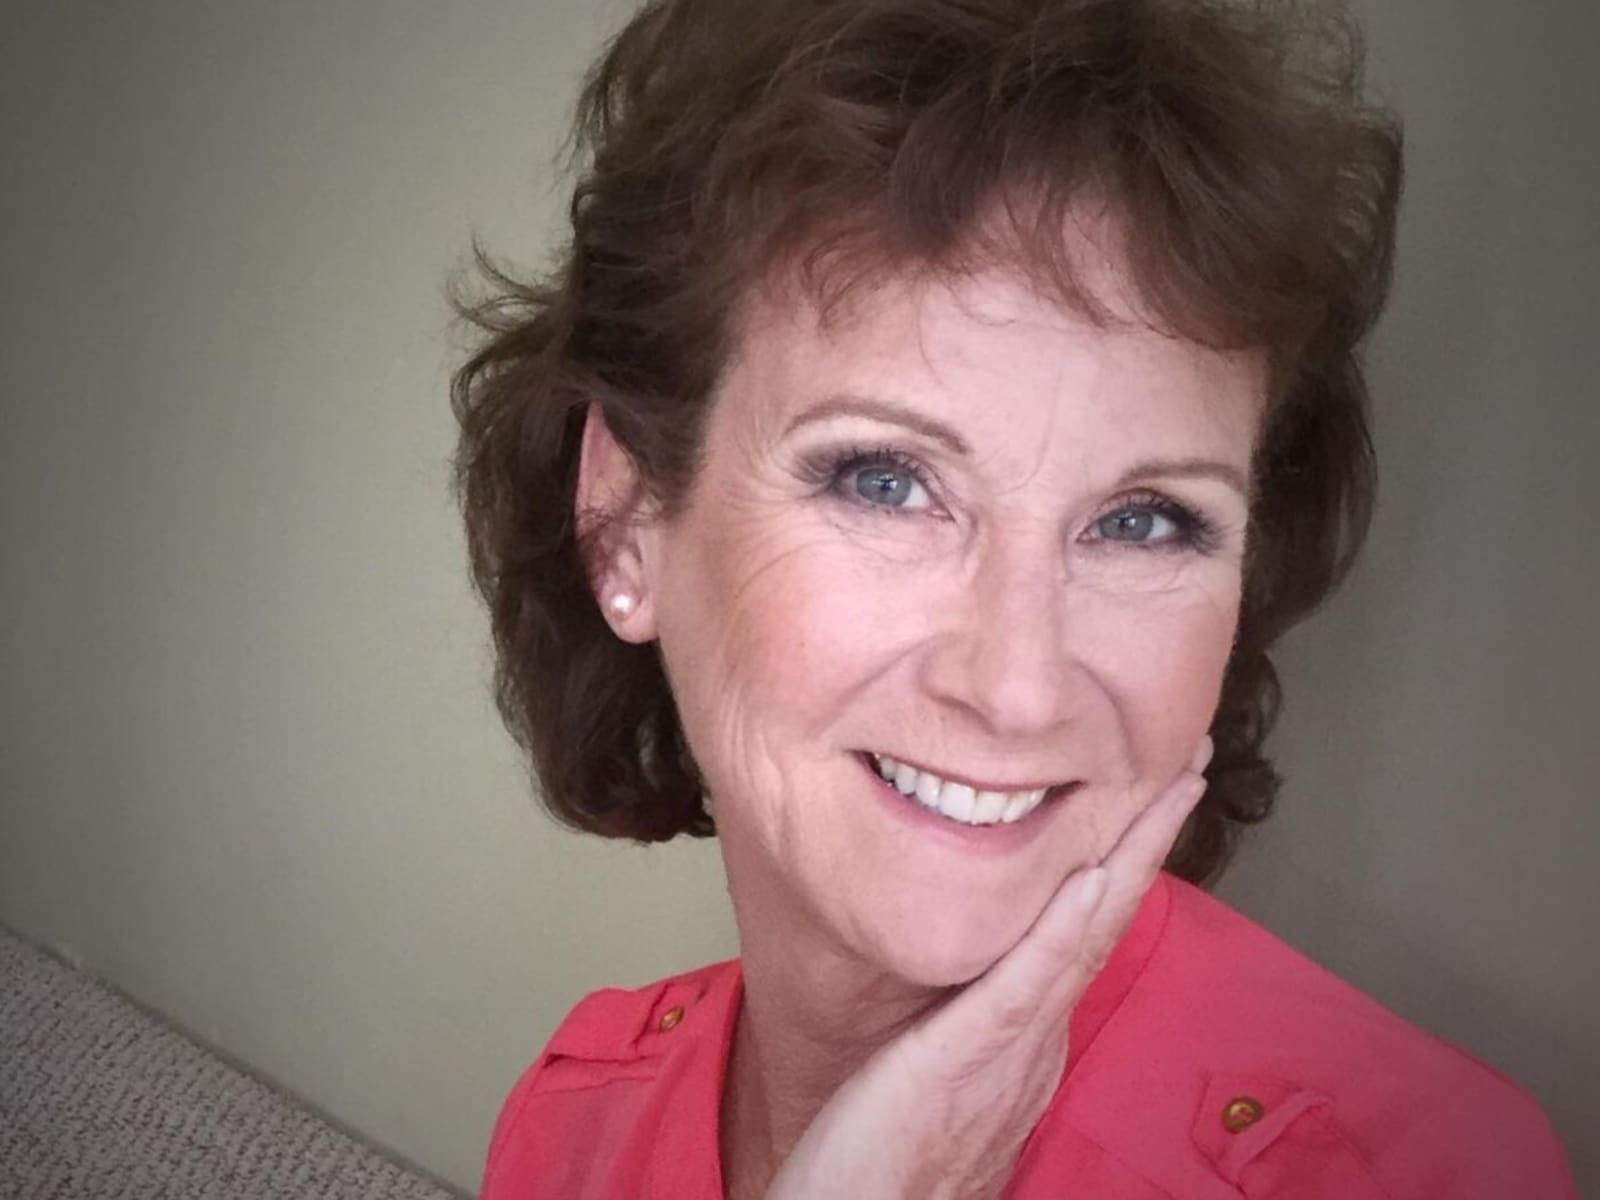 Susan from Burns Lake, British Columbia, Canada